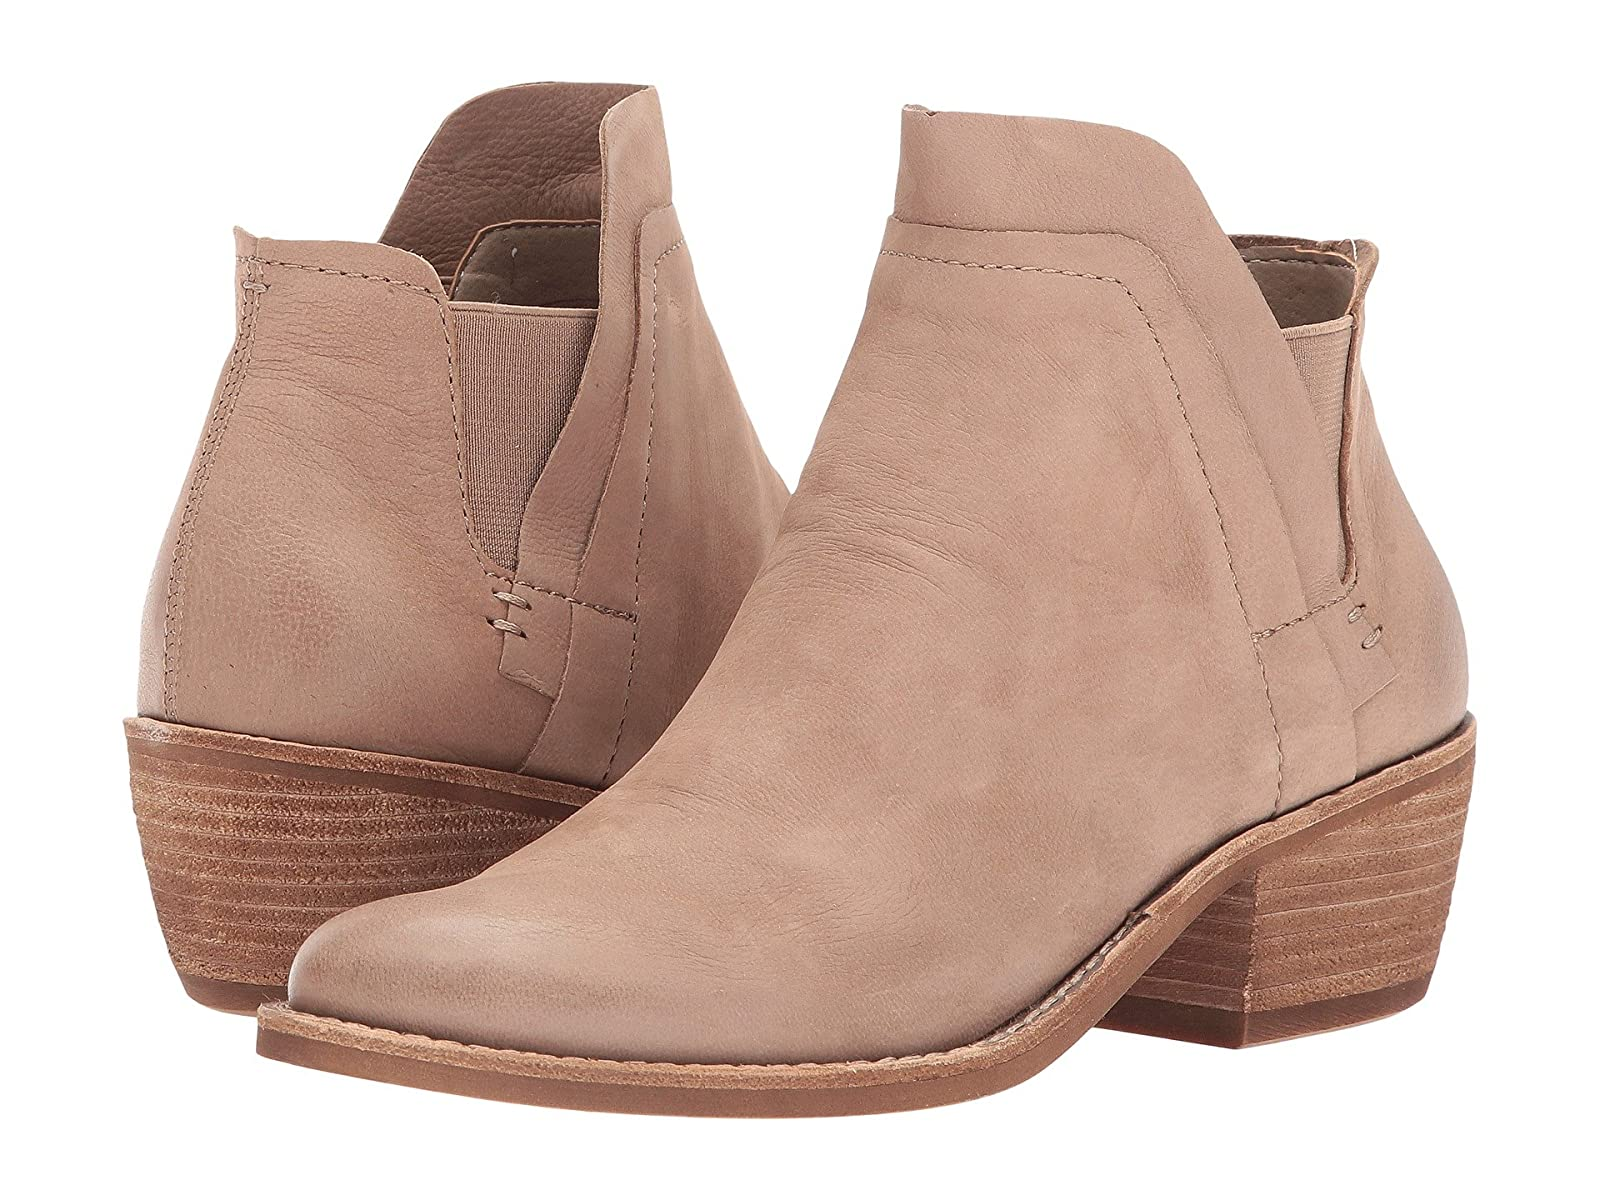 Dolce Vita ZabiCheap and distinctive eye-catching shoes